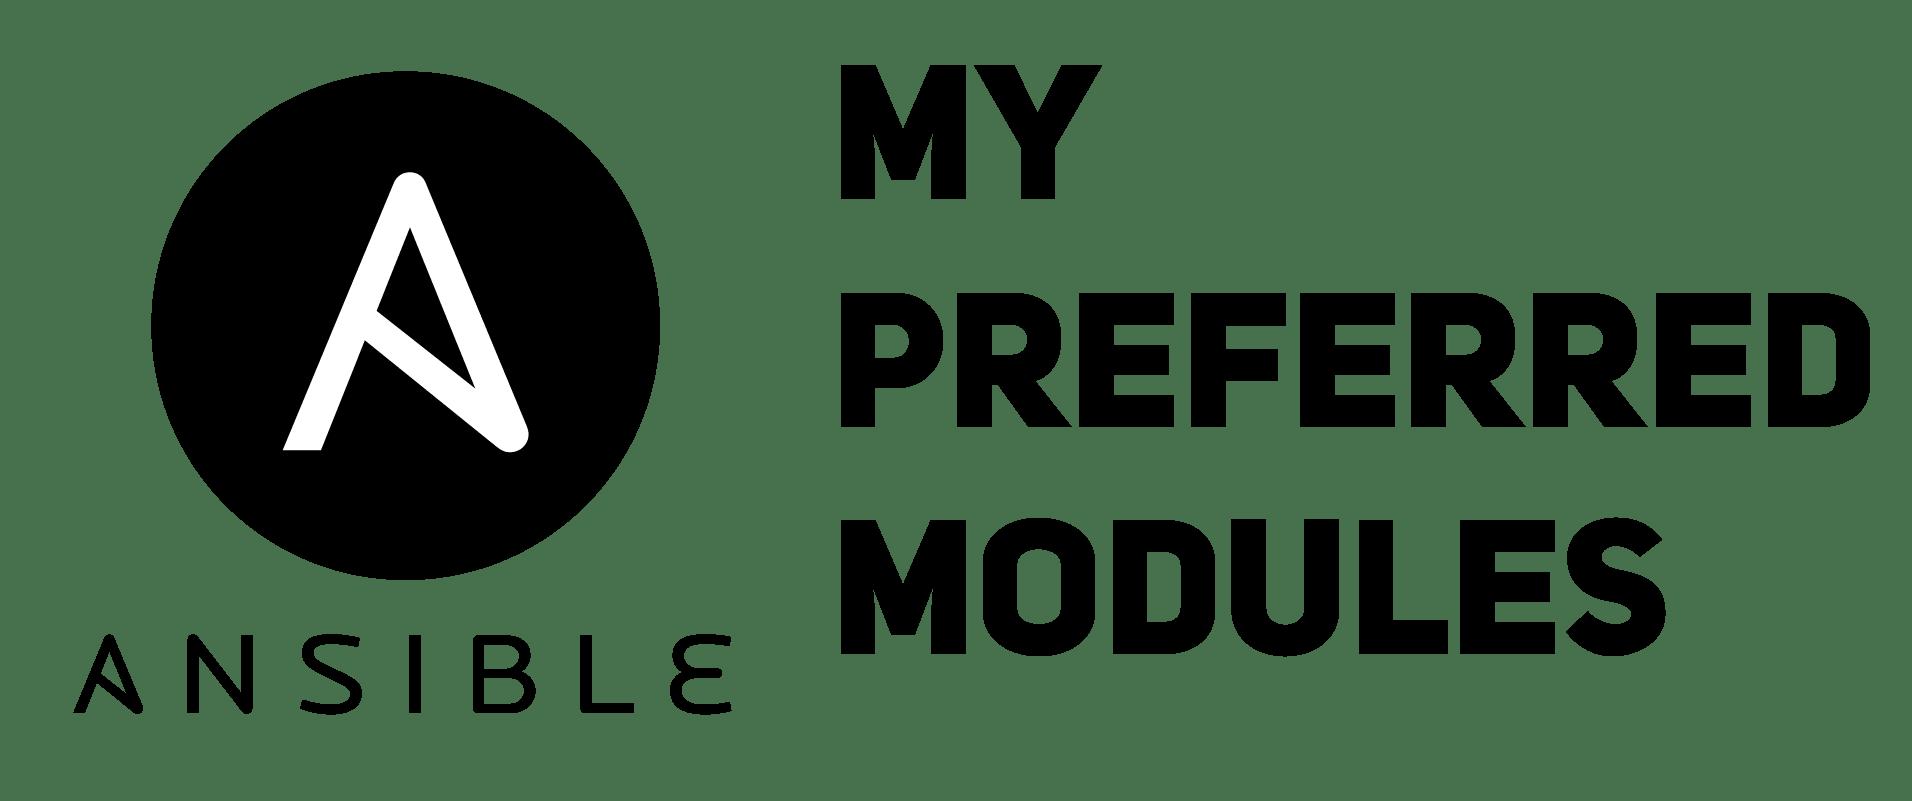 Ansible  My preferred modules - GAINANOV PRO - BLOG